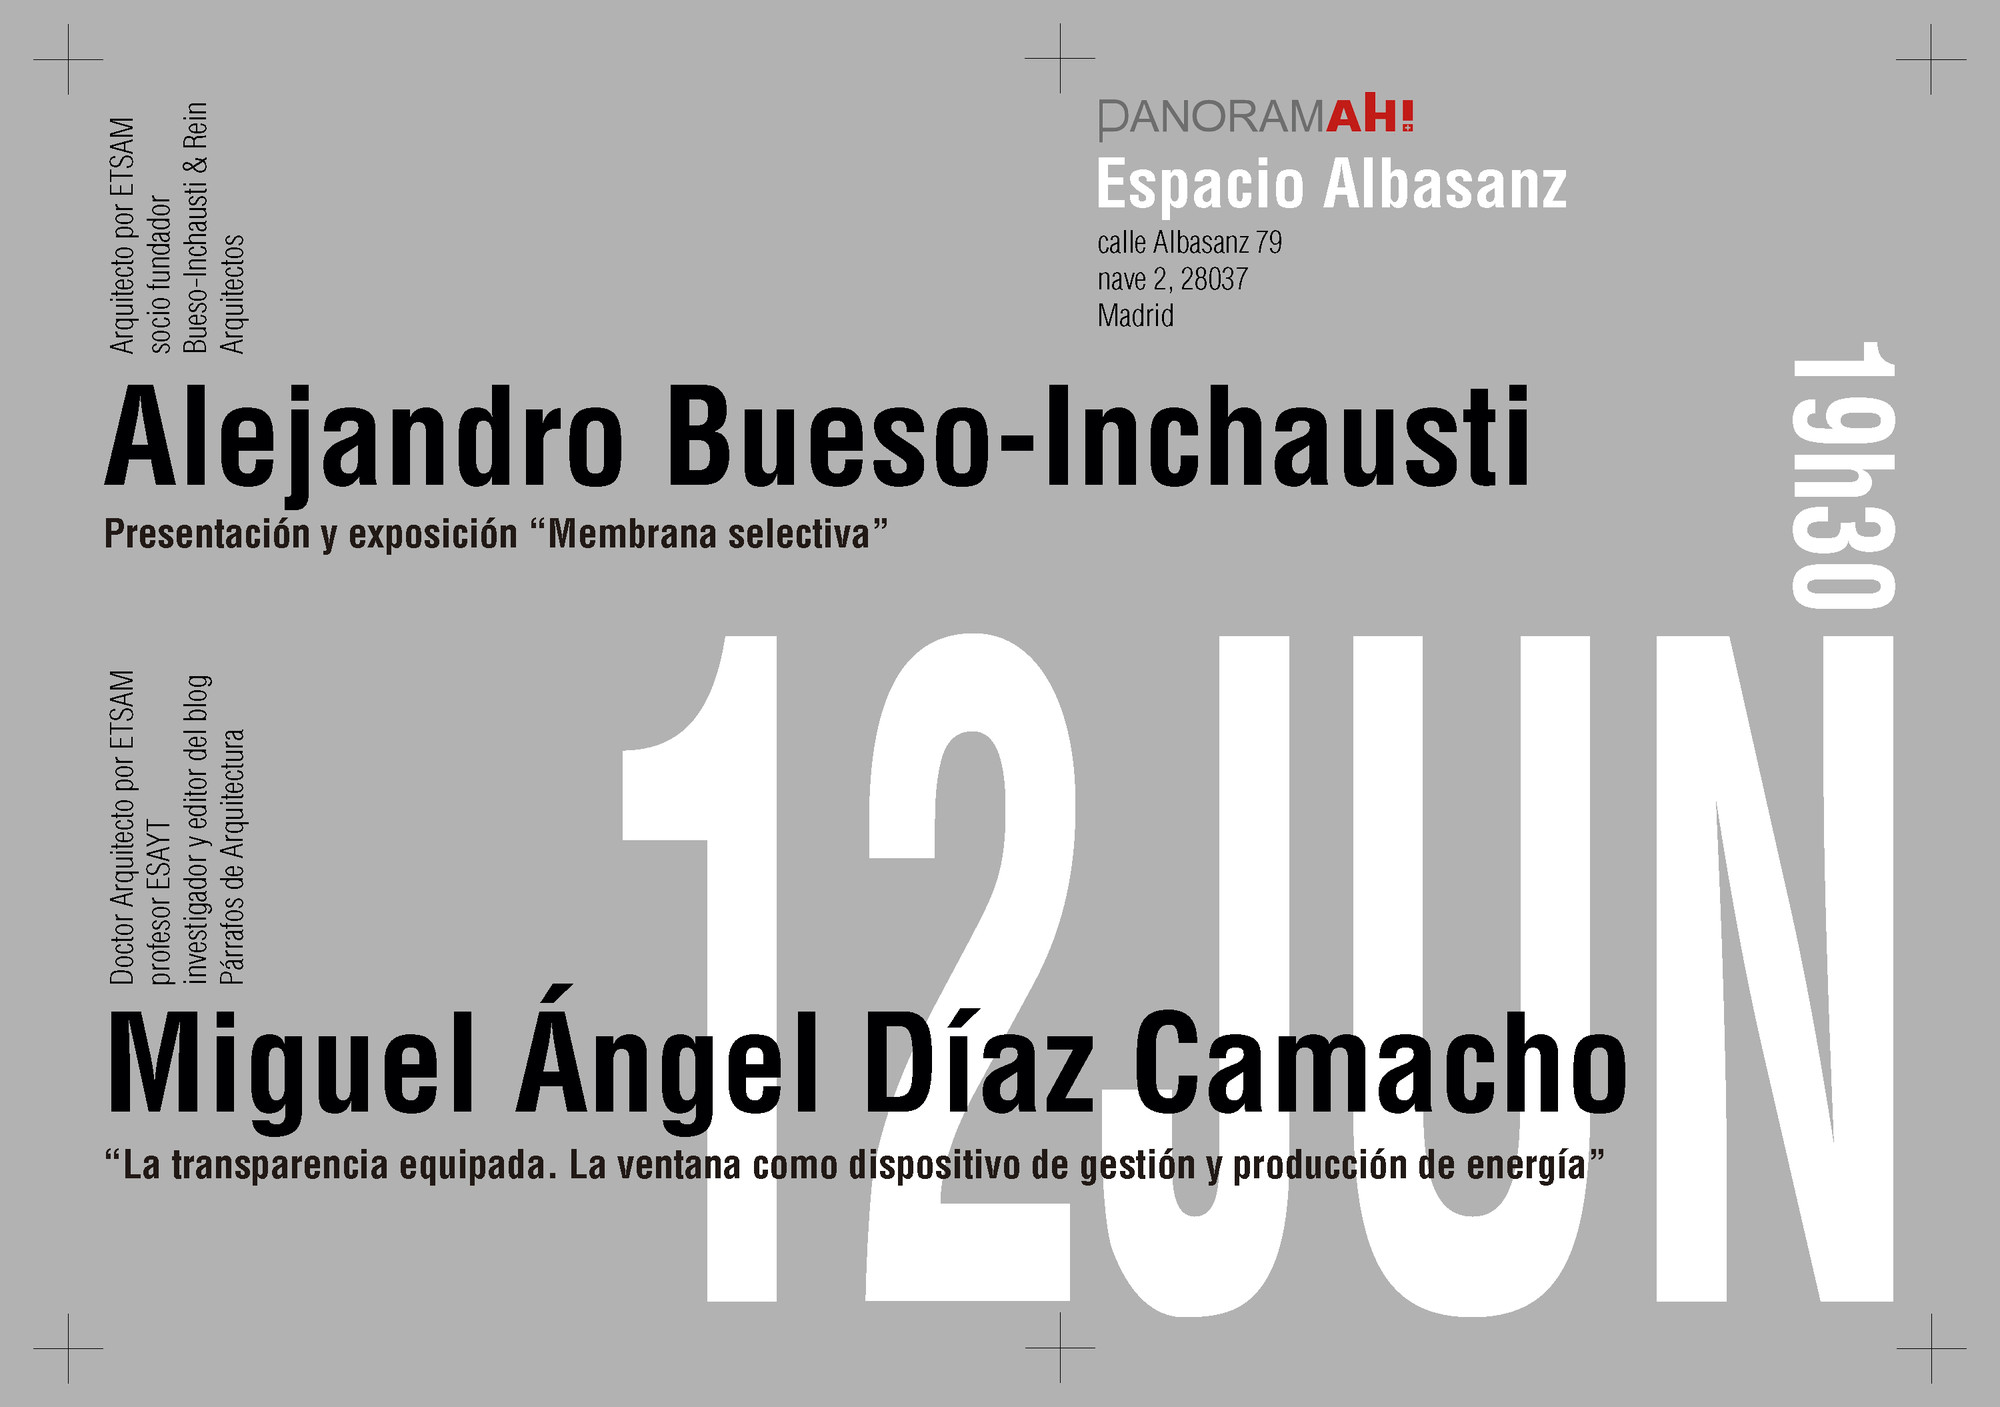 Conferencia Bueso-Inchausti & Rein Arquitectos + MADC Arquitectos, Courtesy of PanoramAH!